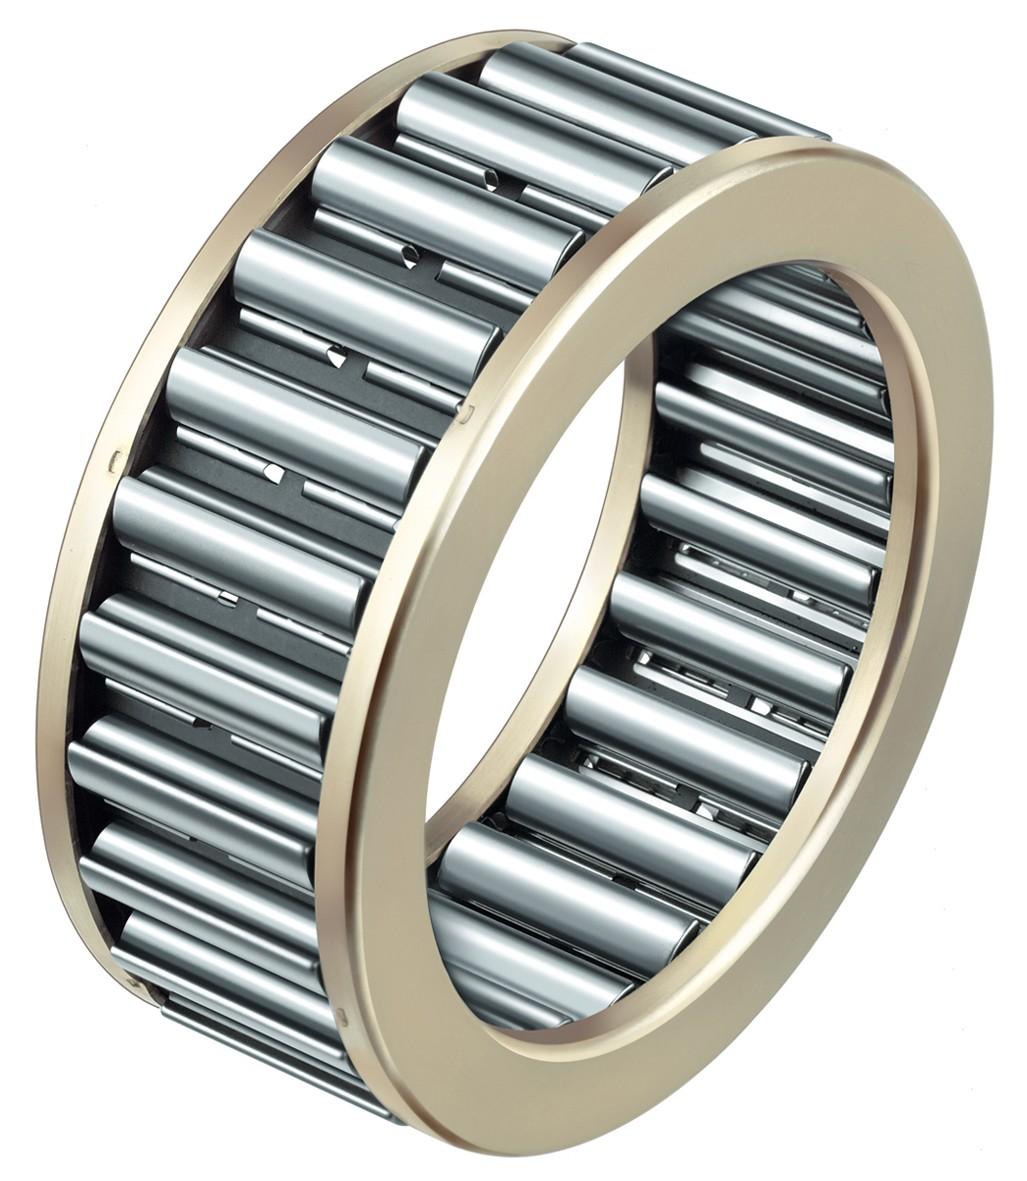 Grease packer LAGP 400 To lubricate open bearings is a low pressure alternative